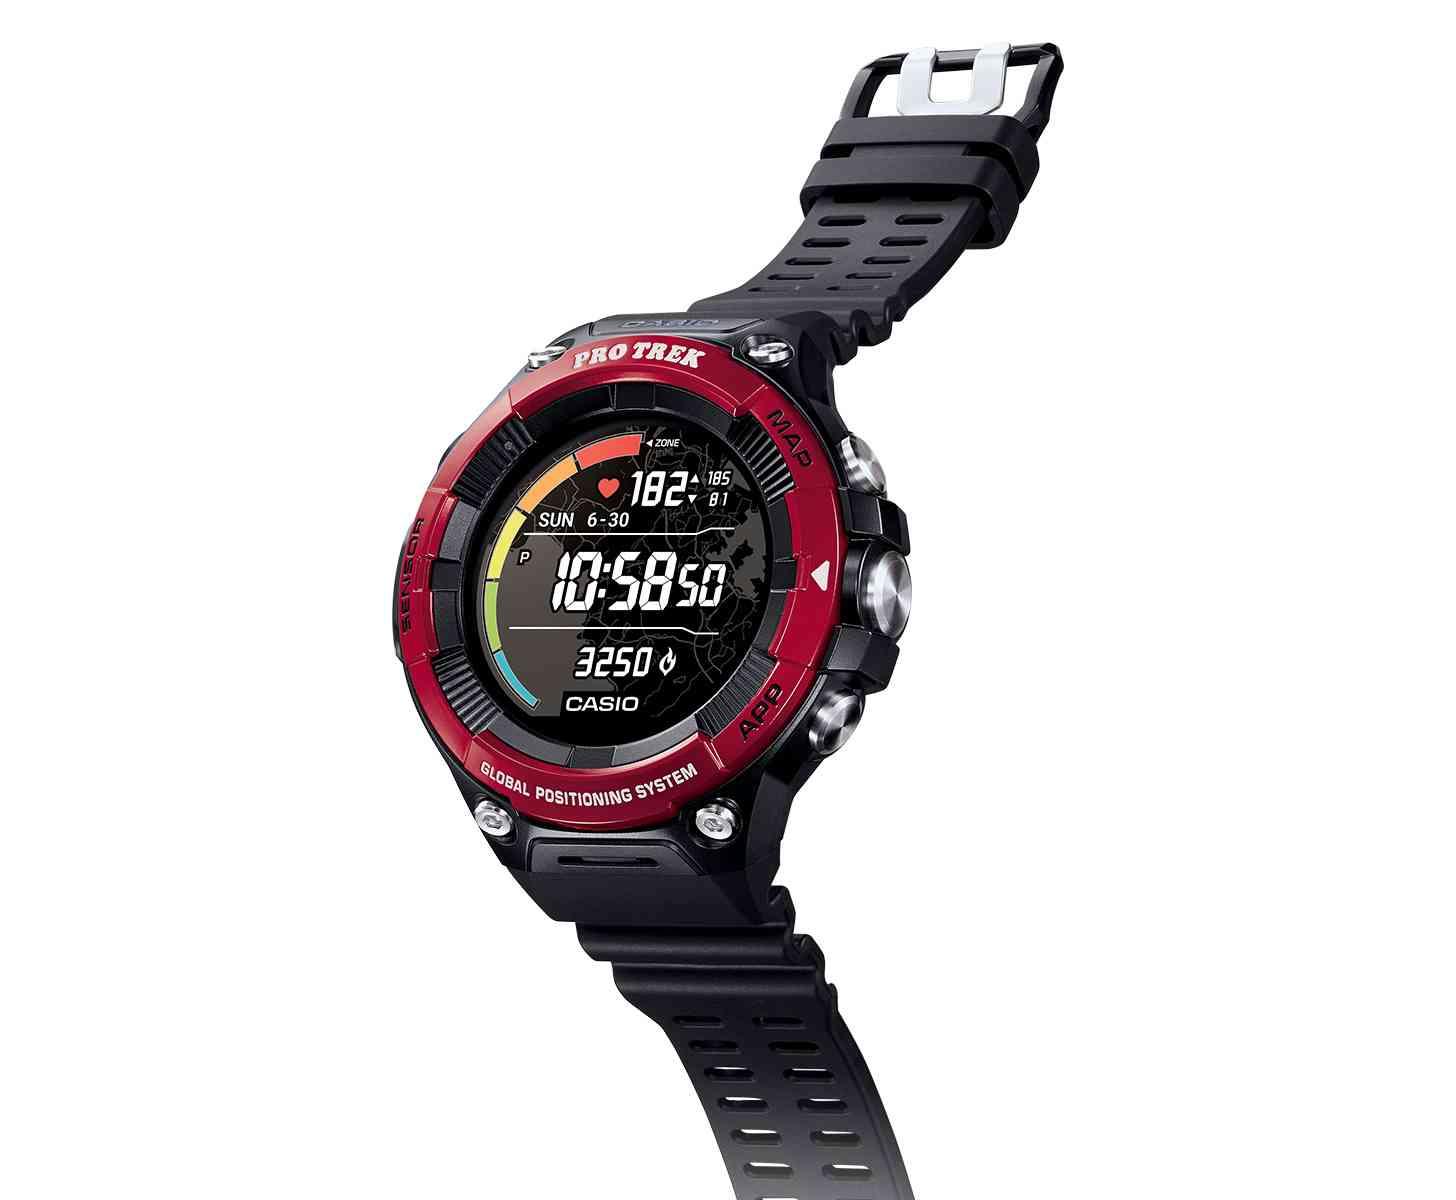 Casio WSD-F21HR Wear OS smartwatch